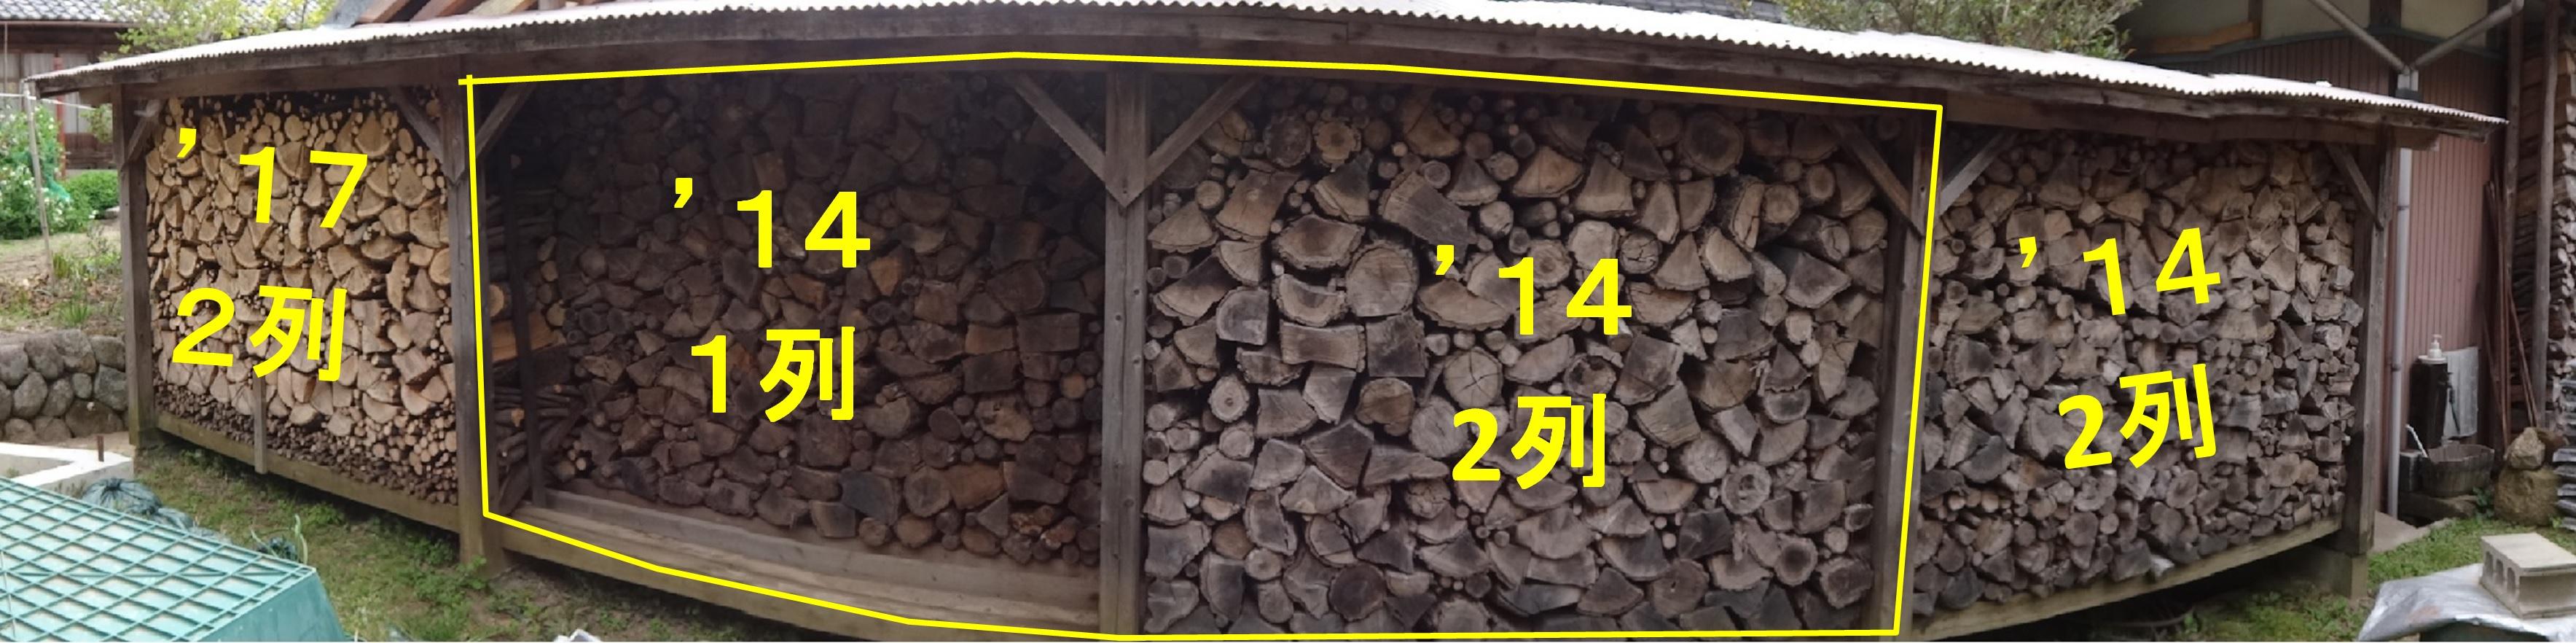 2017050719155903c.jpg